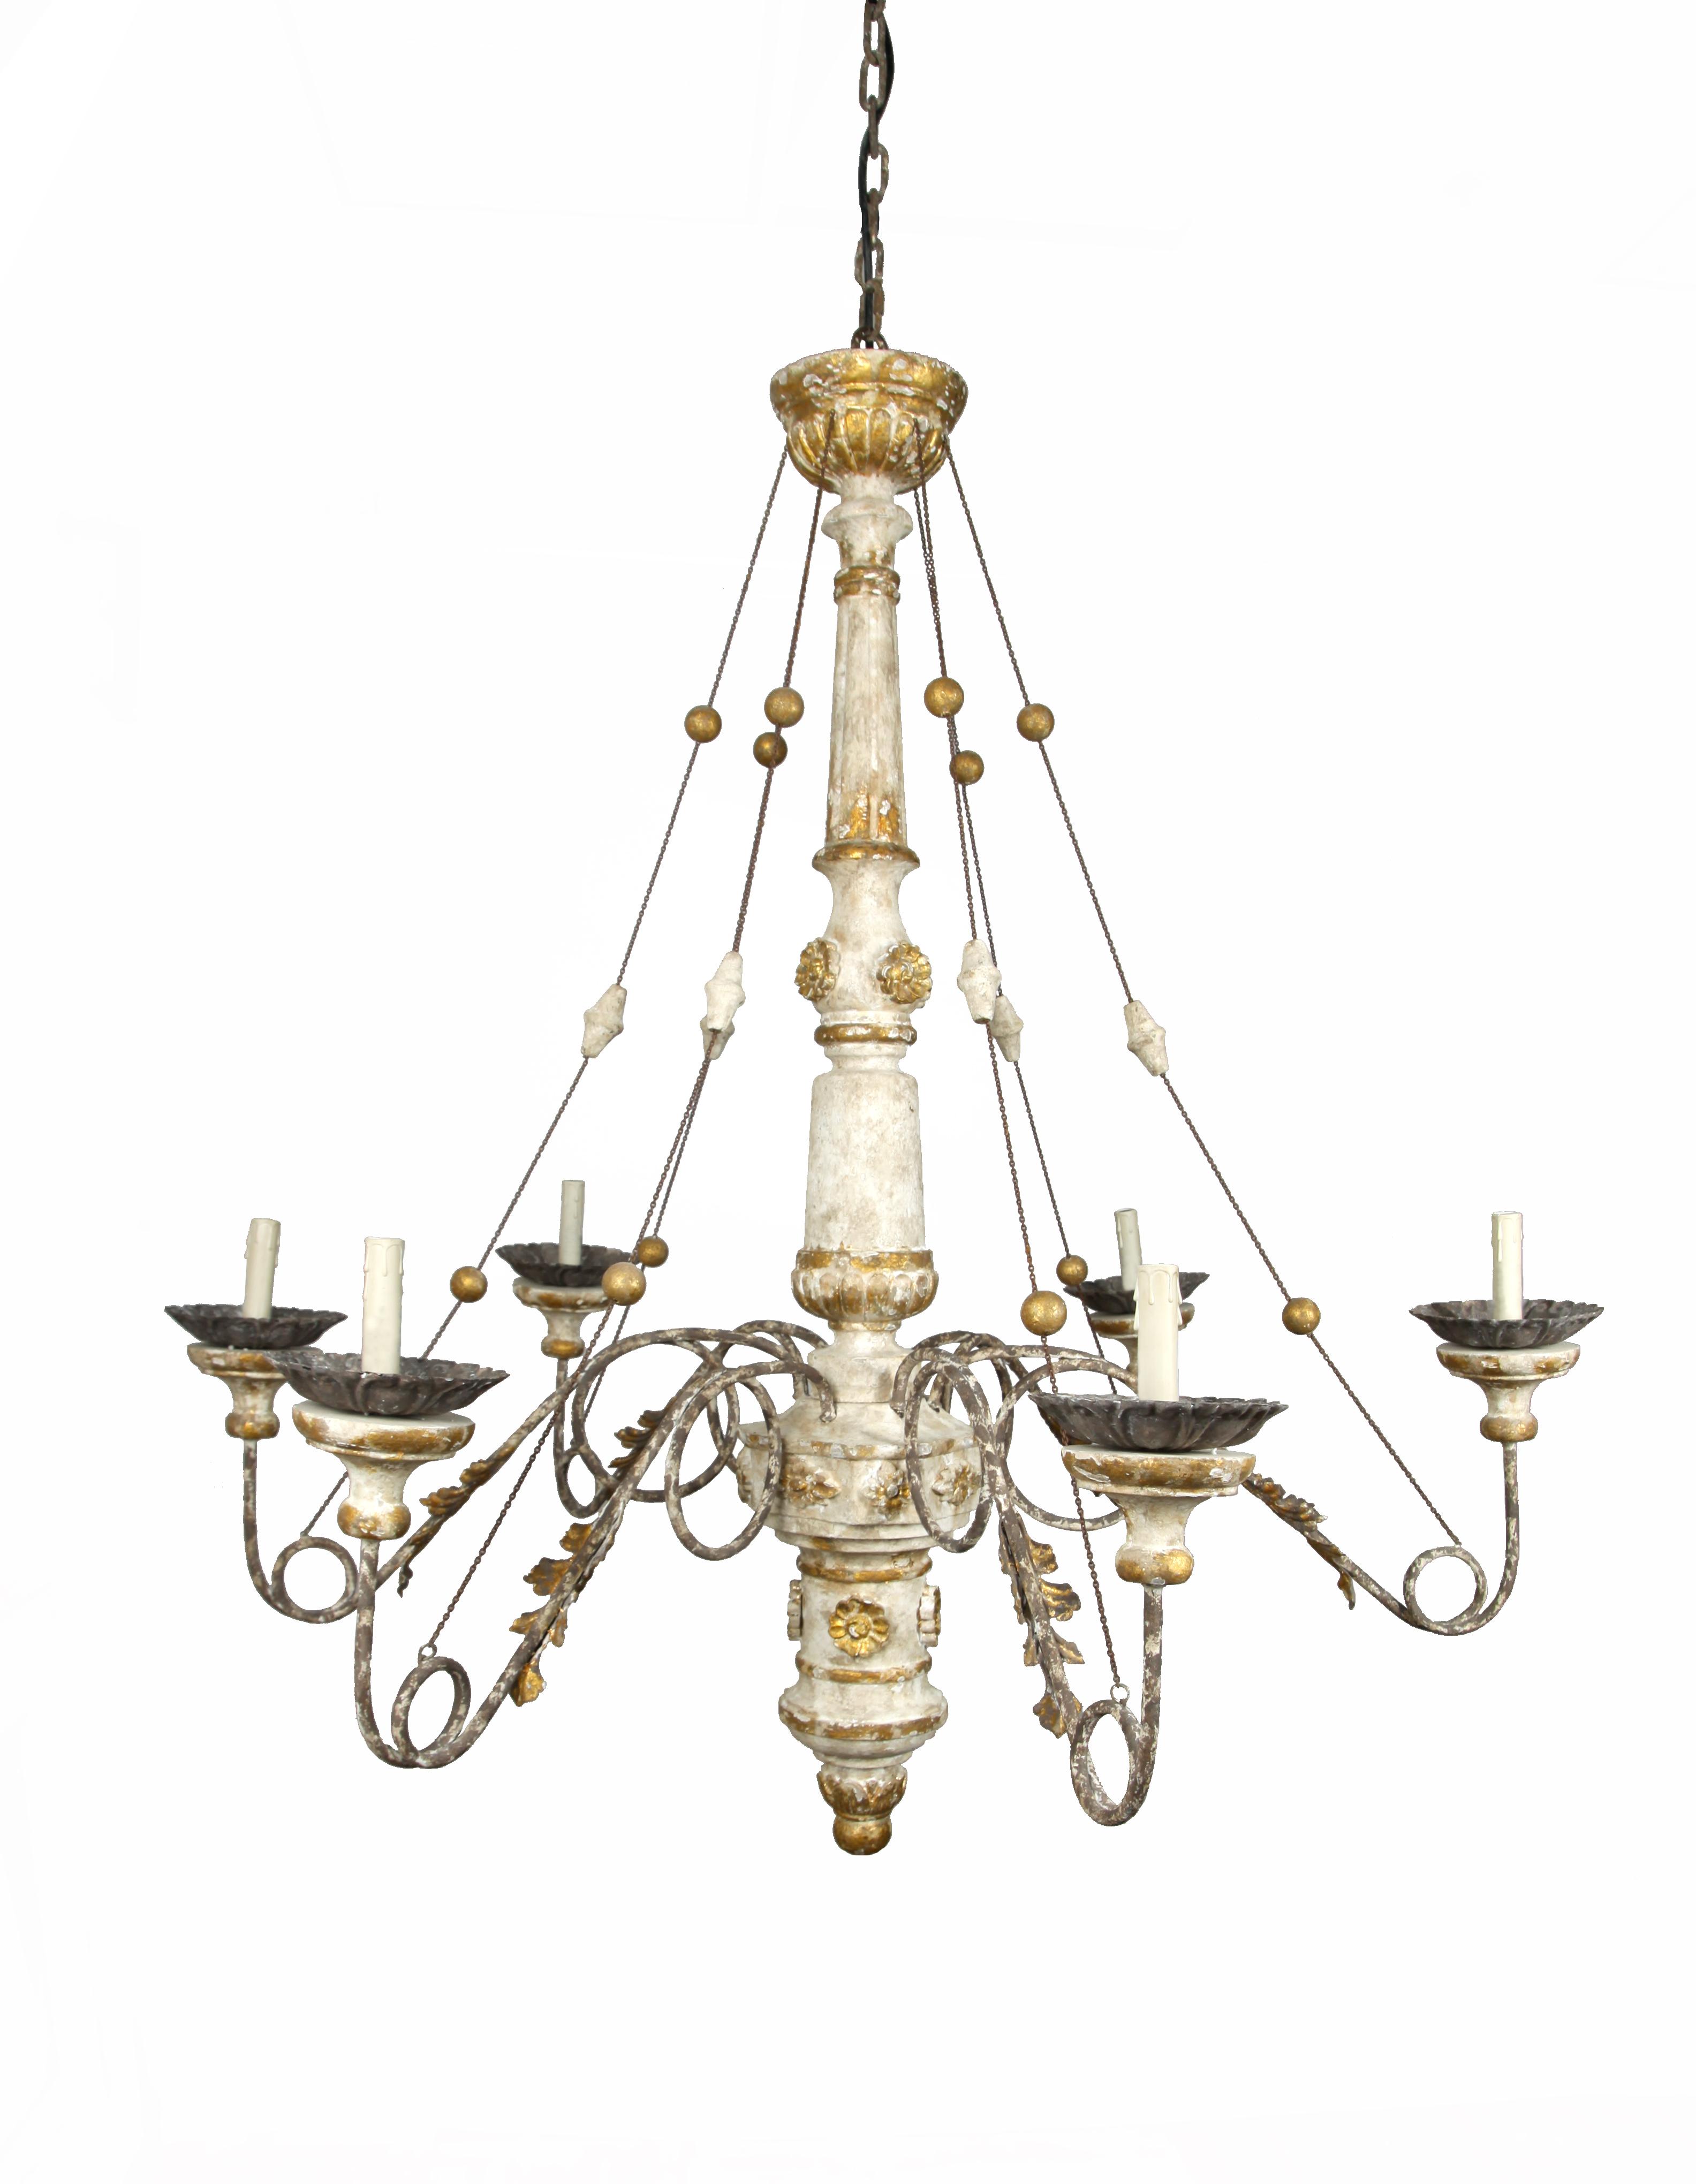 Bliss Studio Valeria candelabra chandelier